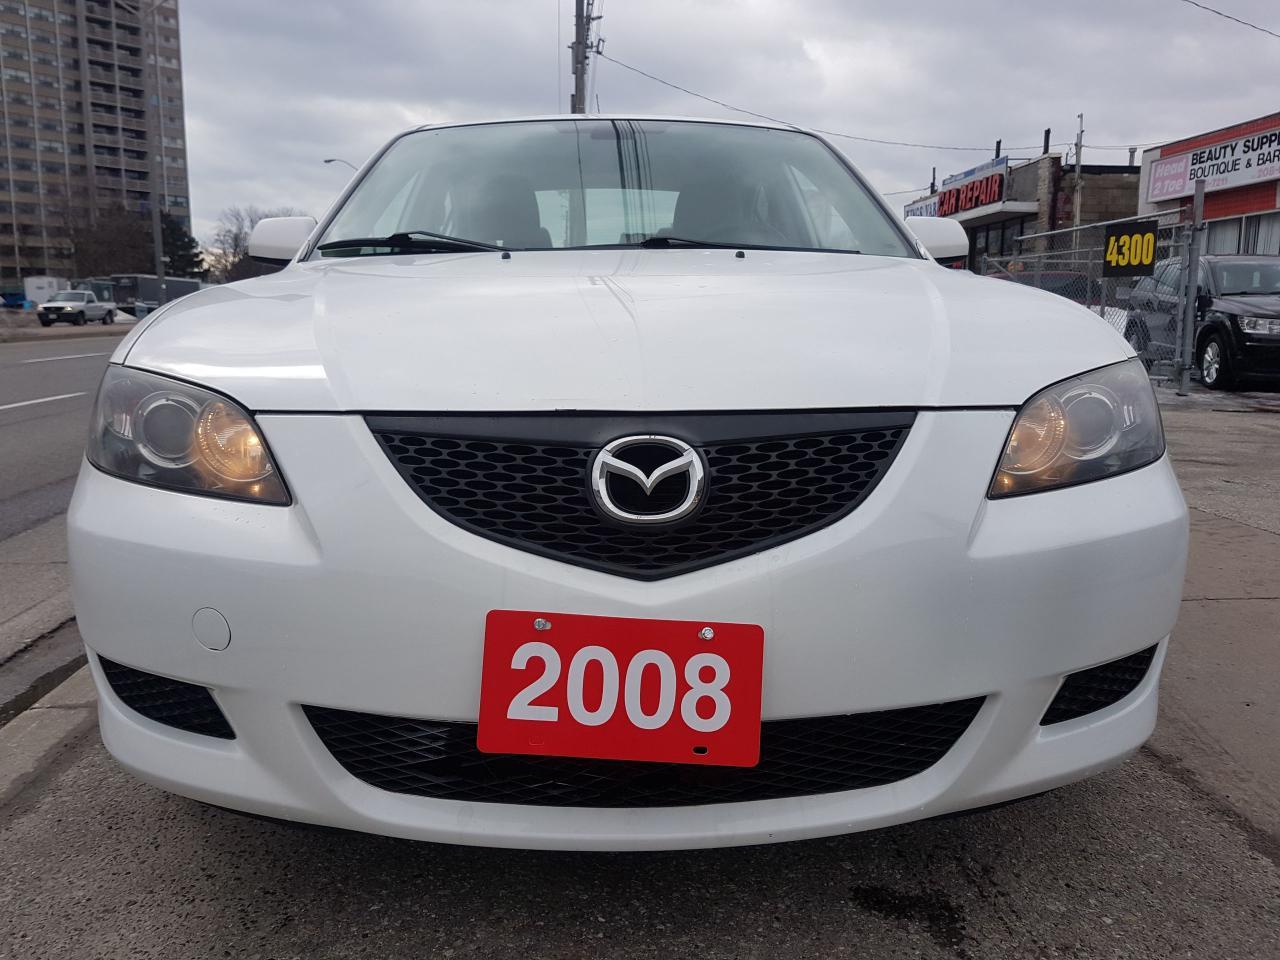 2008 Mazda MAZDA3 GX - Mint Condition, Extra Clean, SunRoof, Alloys